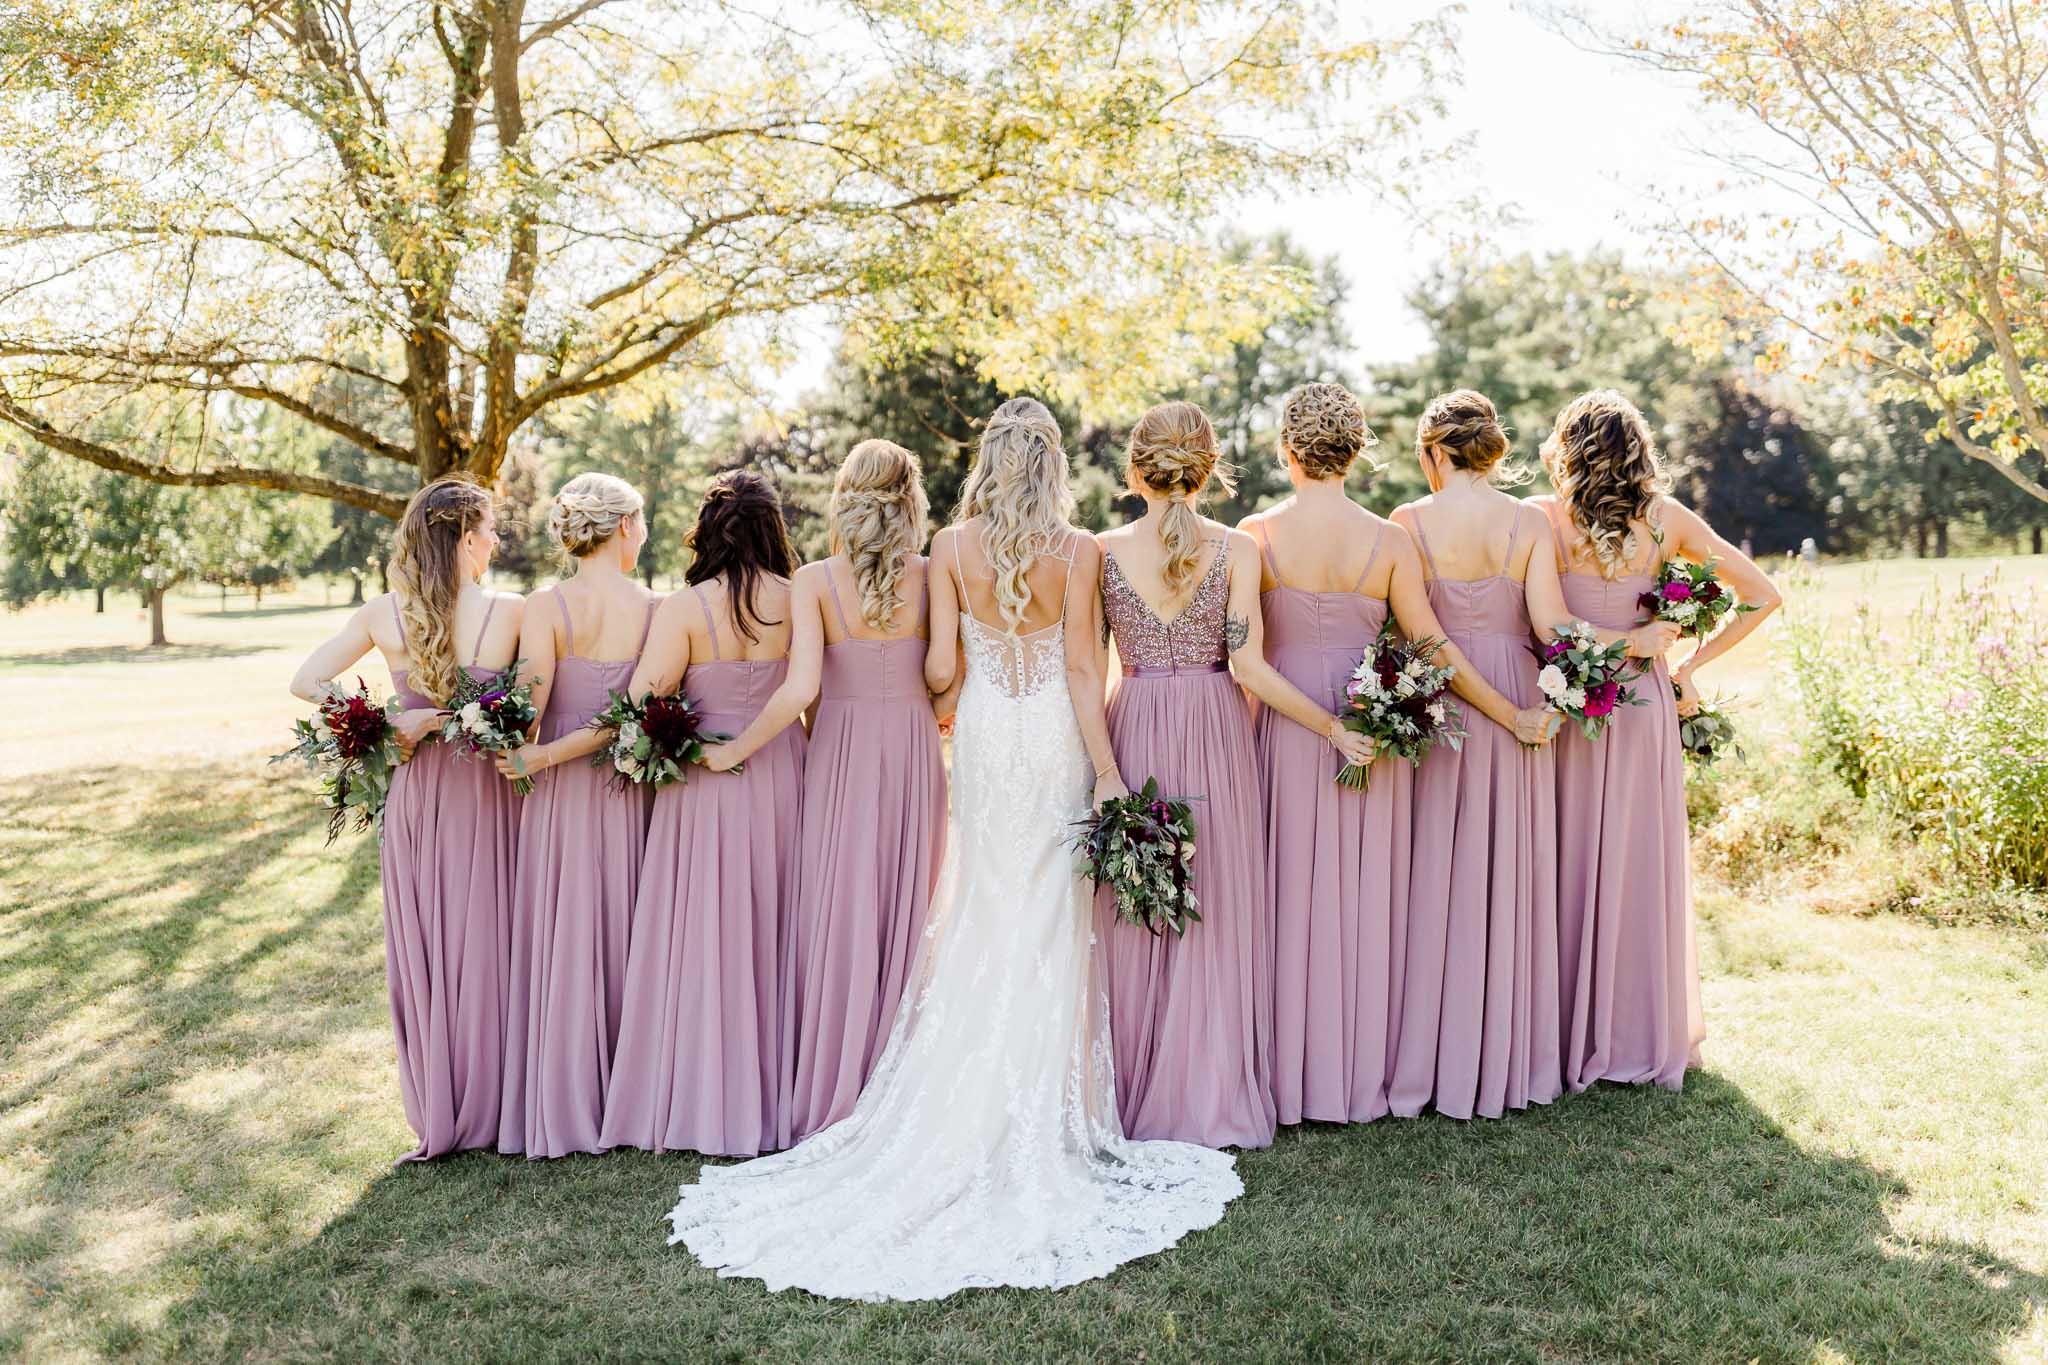 Frosty-Valley-September-Wedding-7606.jpg